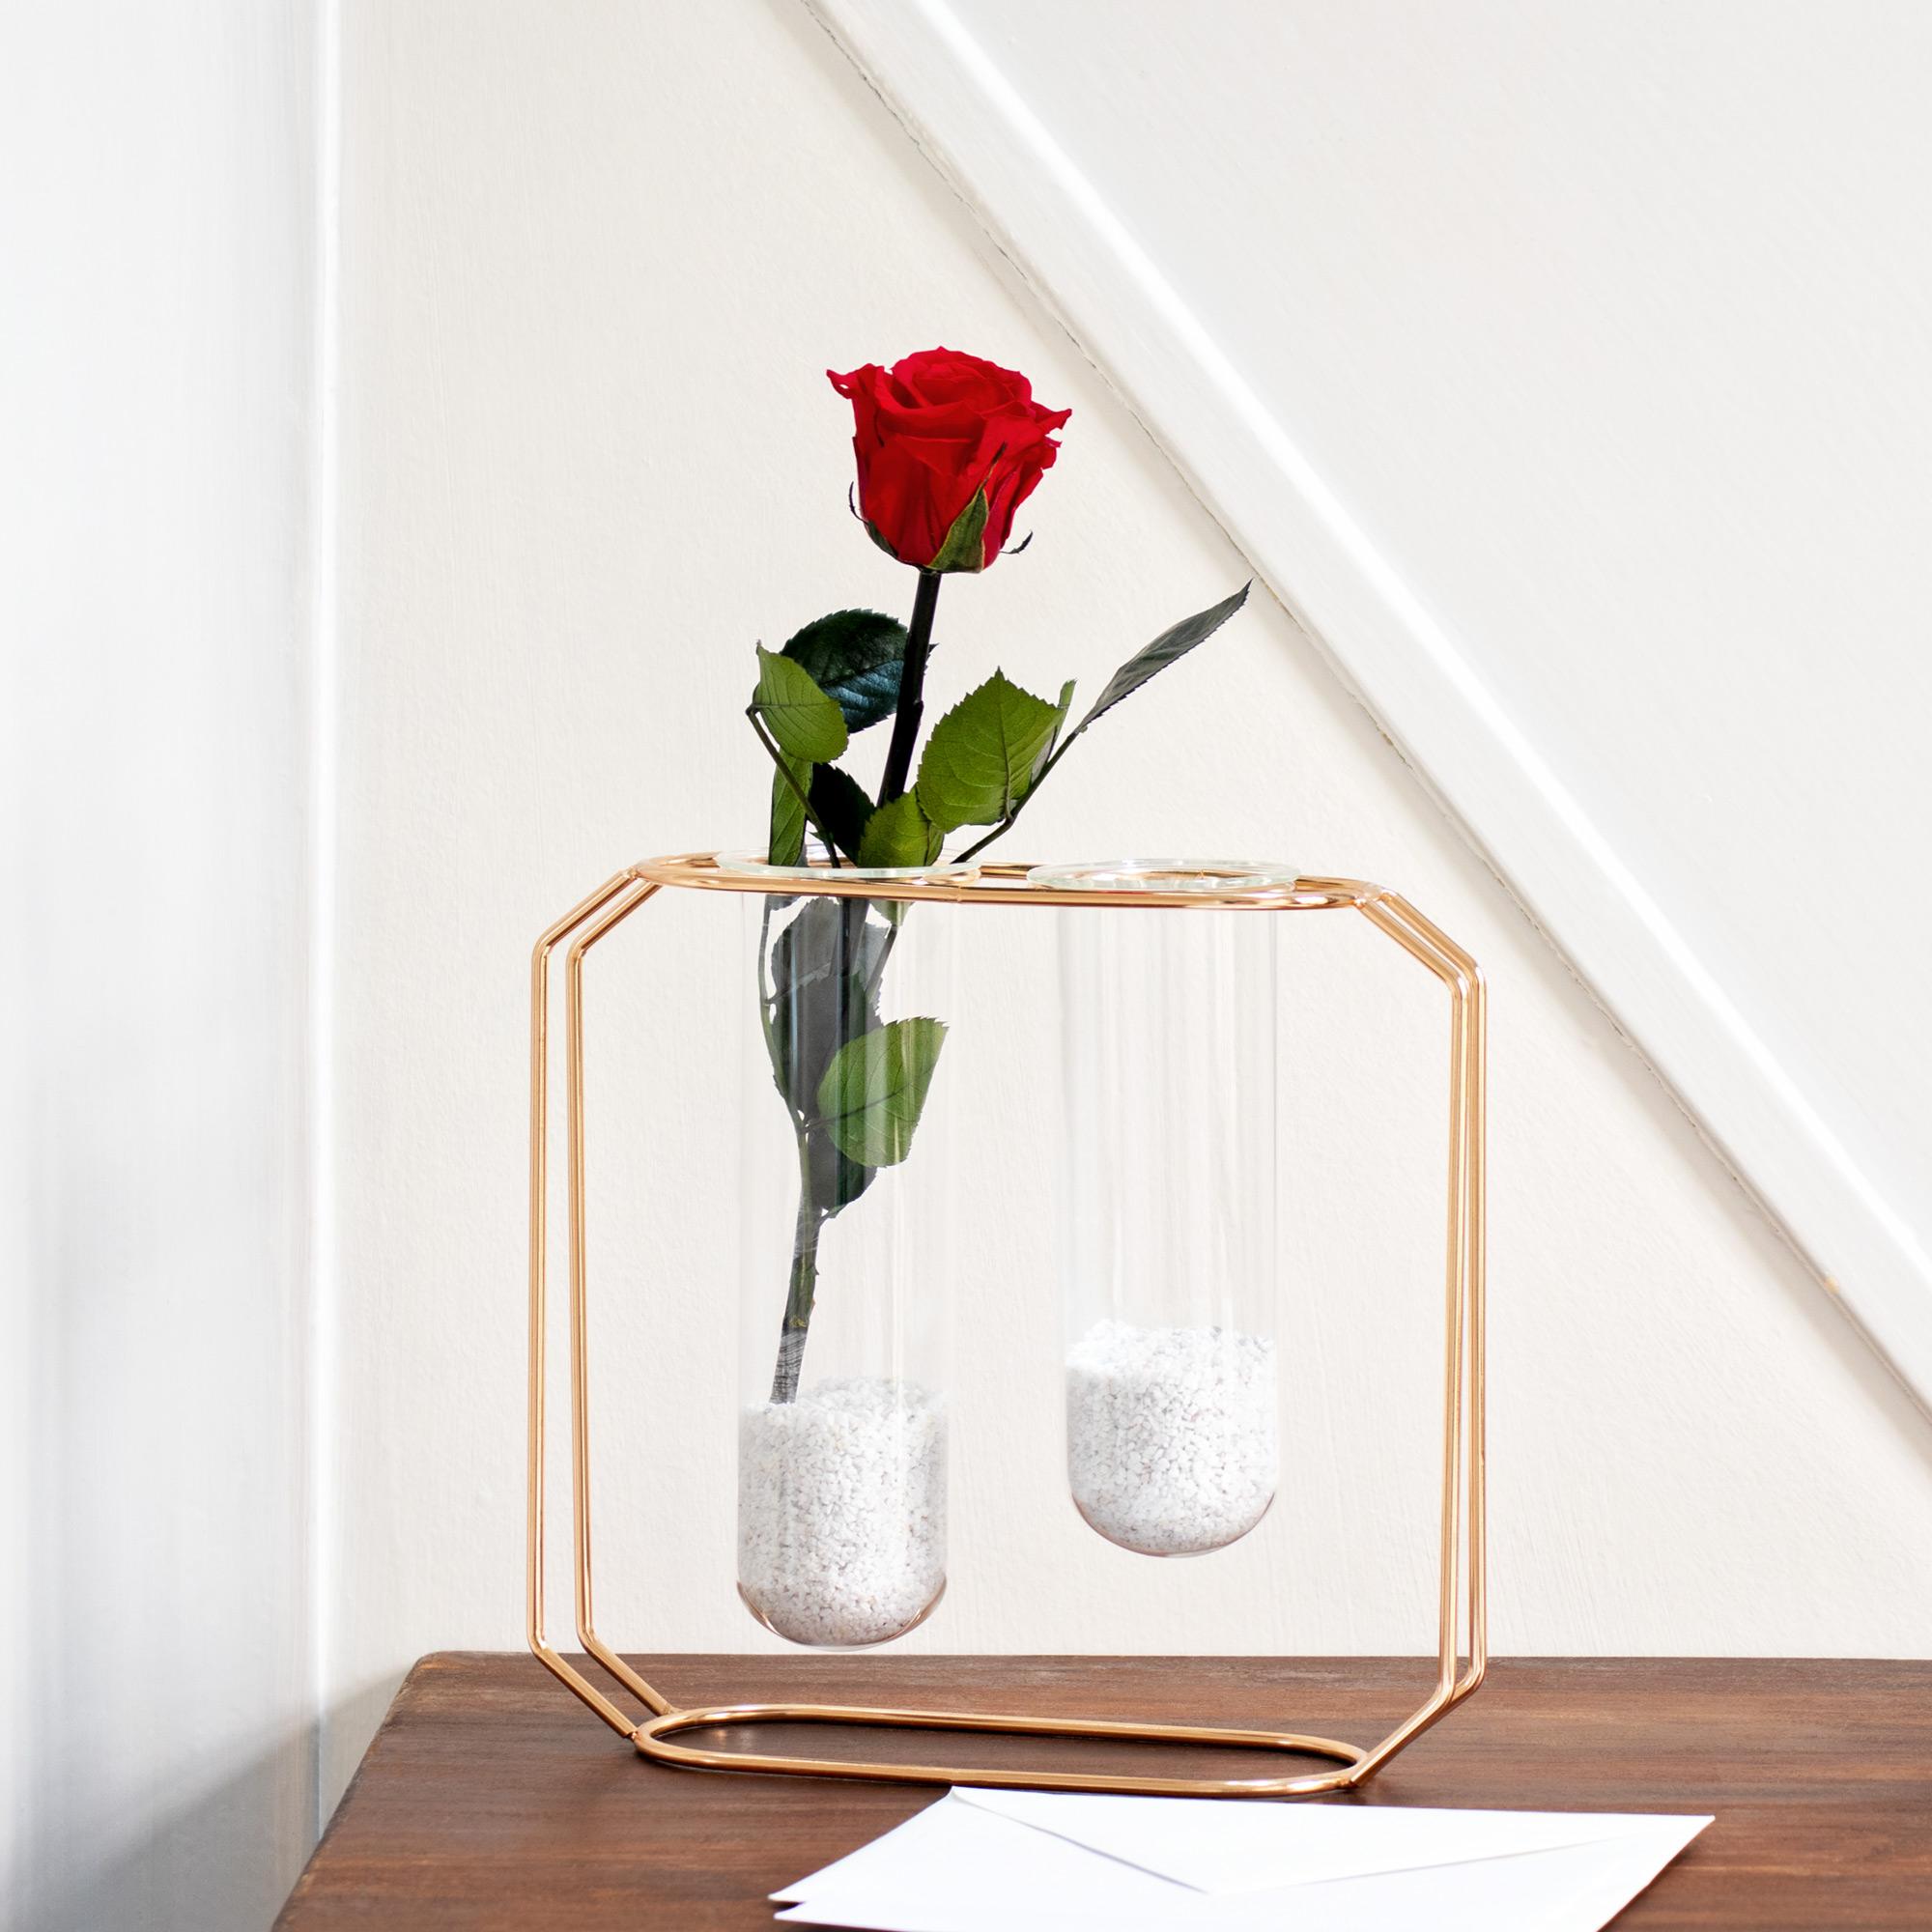 rose imp rissable un cadeau extraordinaire. Black Bedroom Furniture Sets. Home Design Ideas